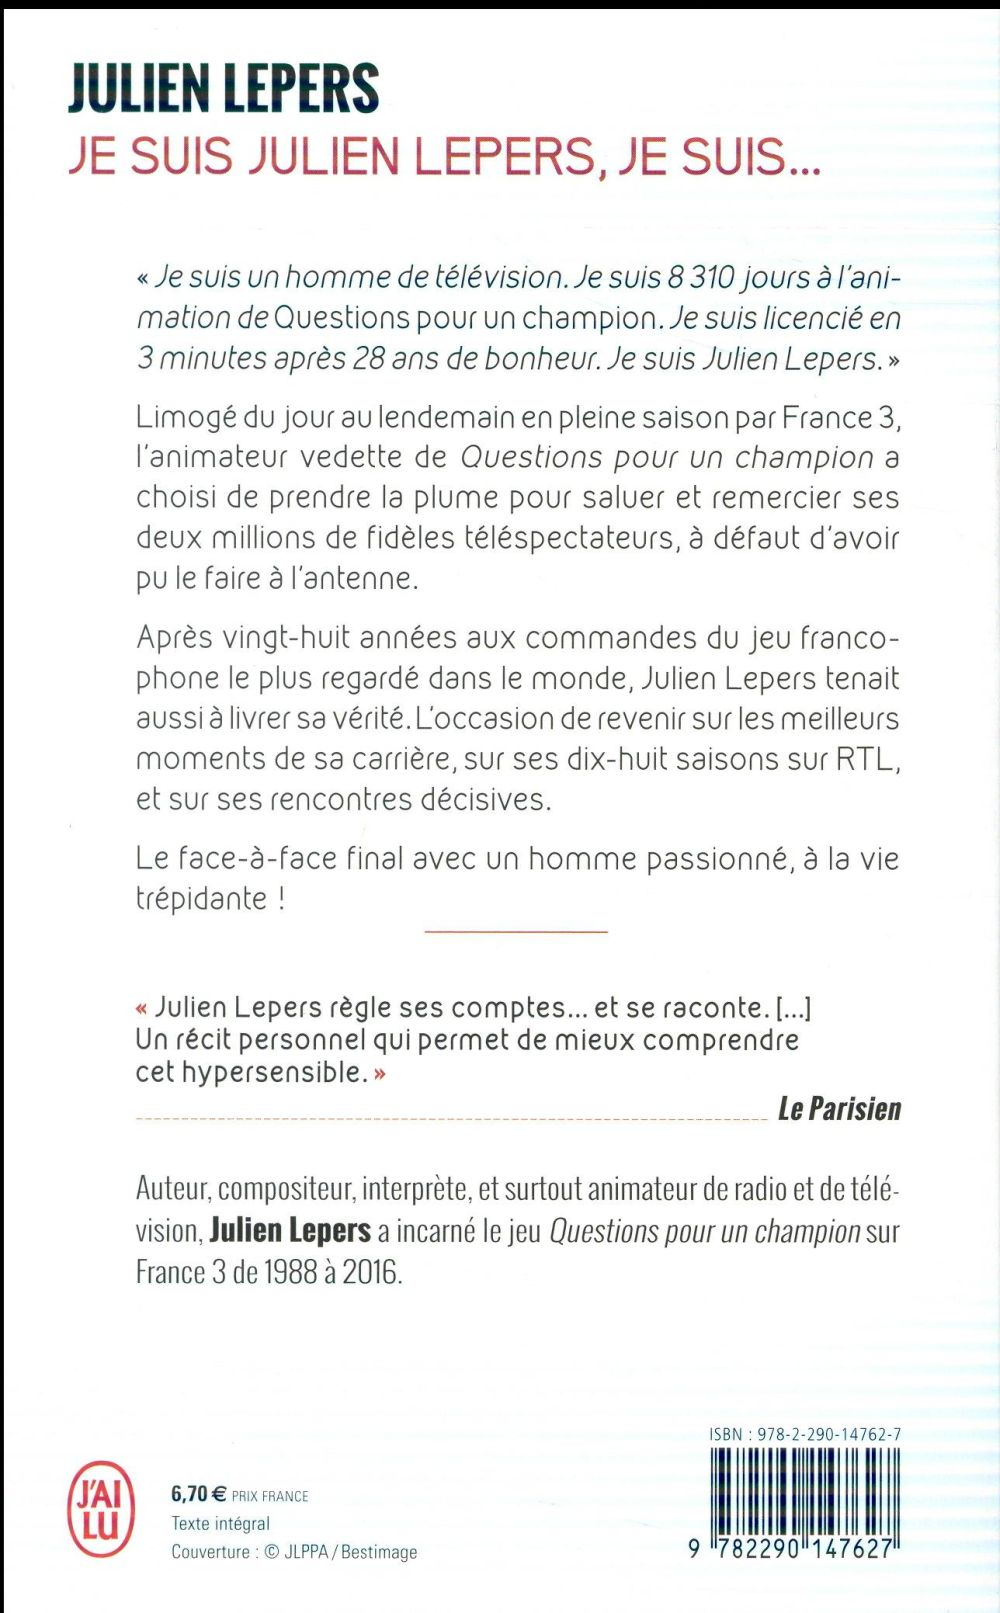 Je suis, je suis... Julien Lepers